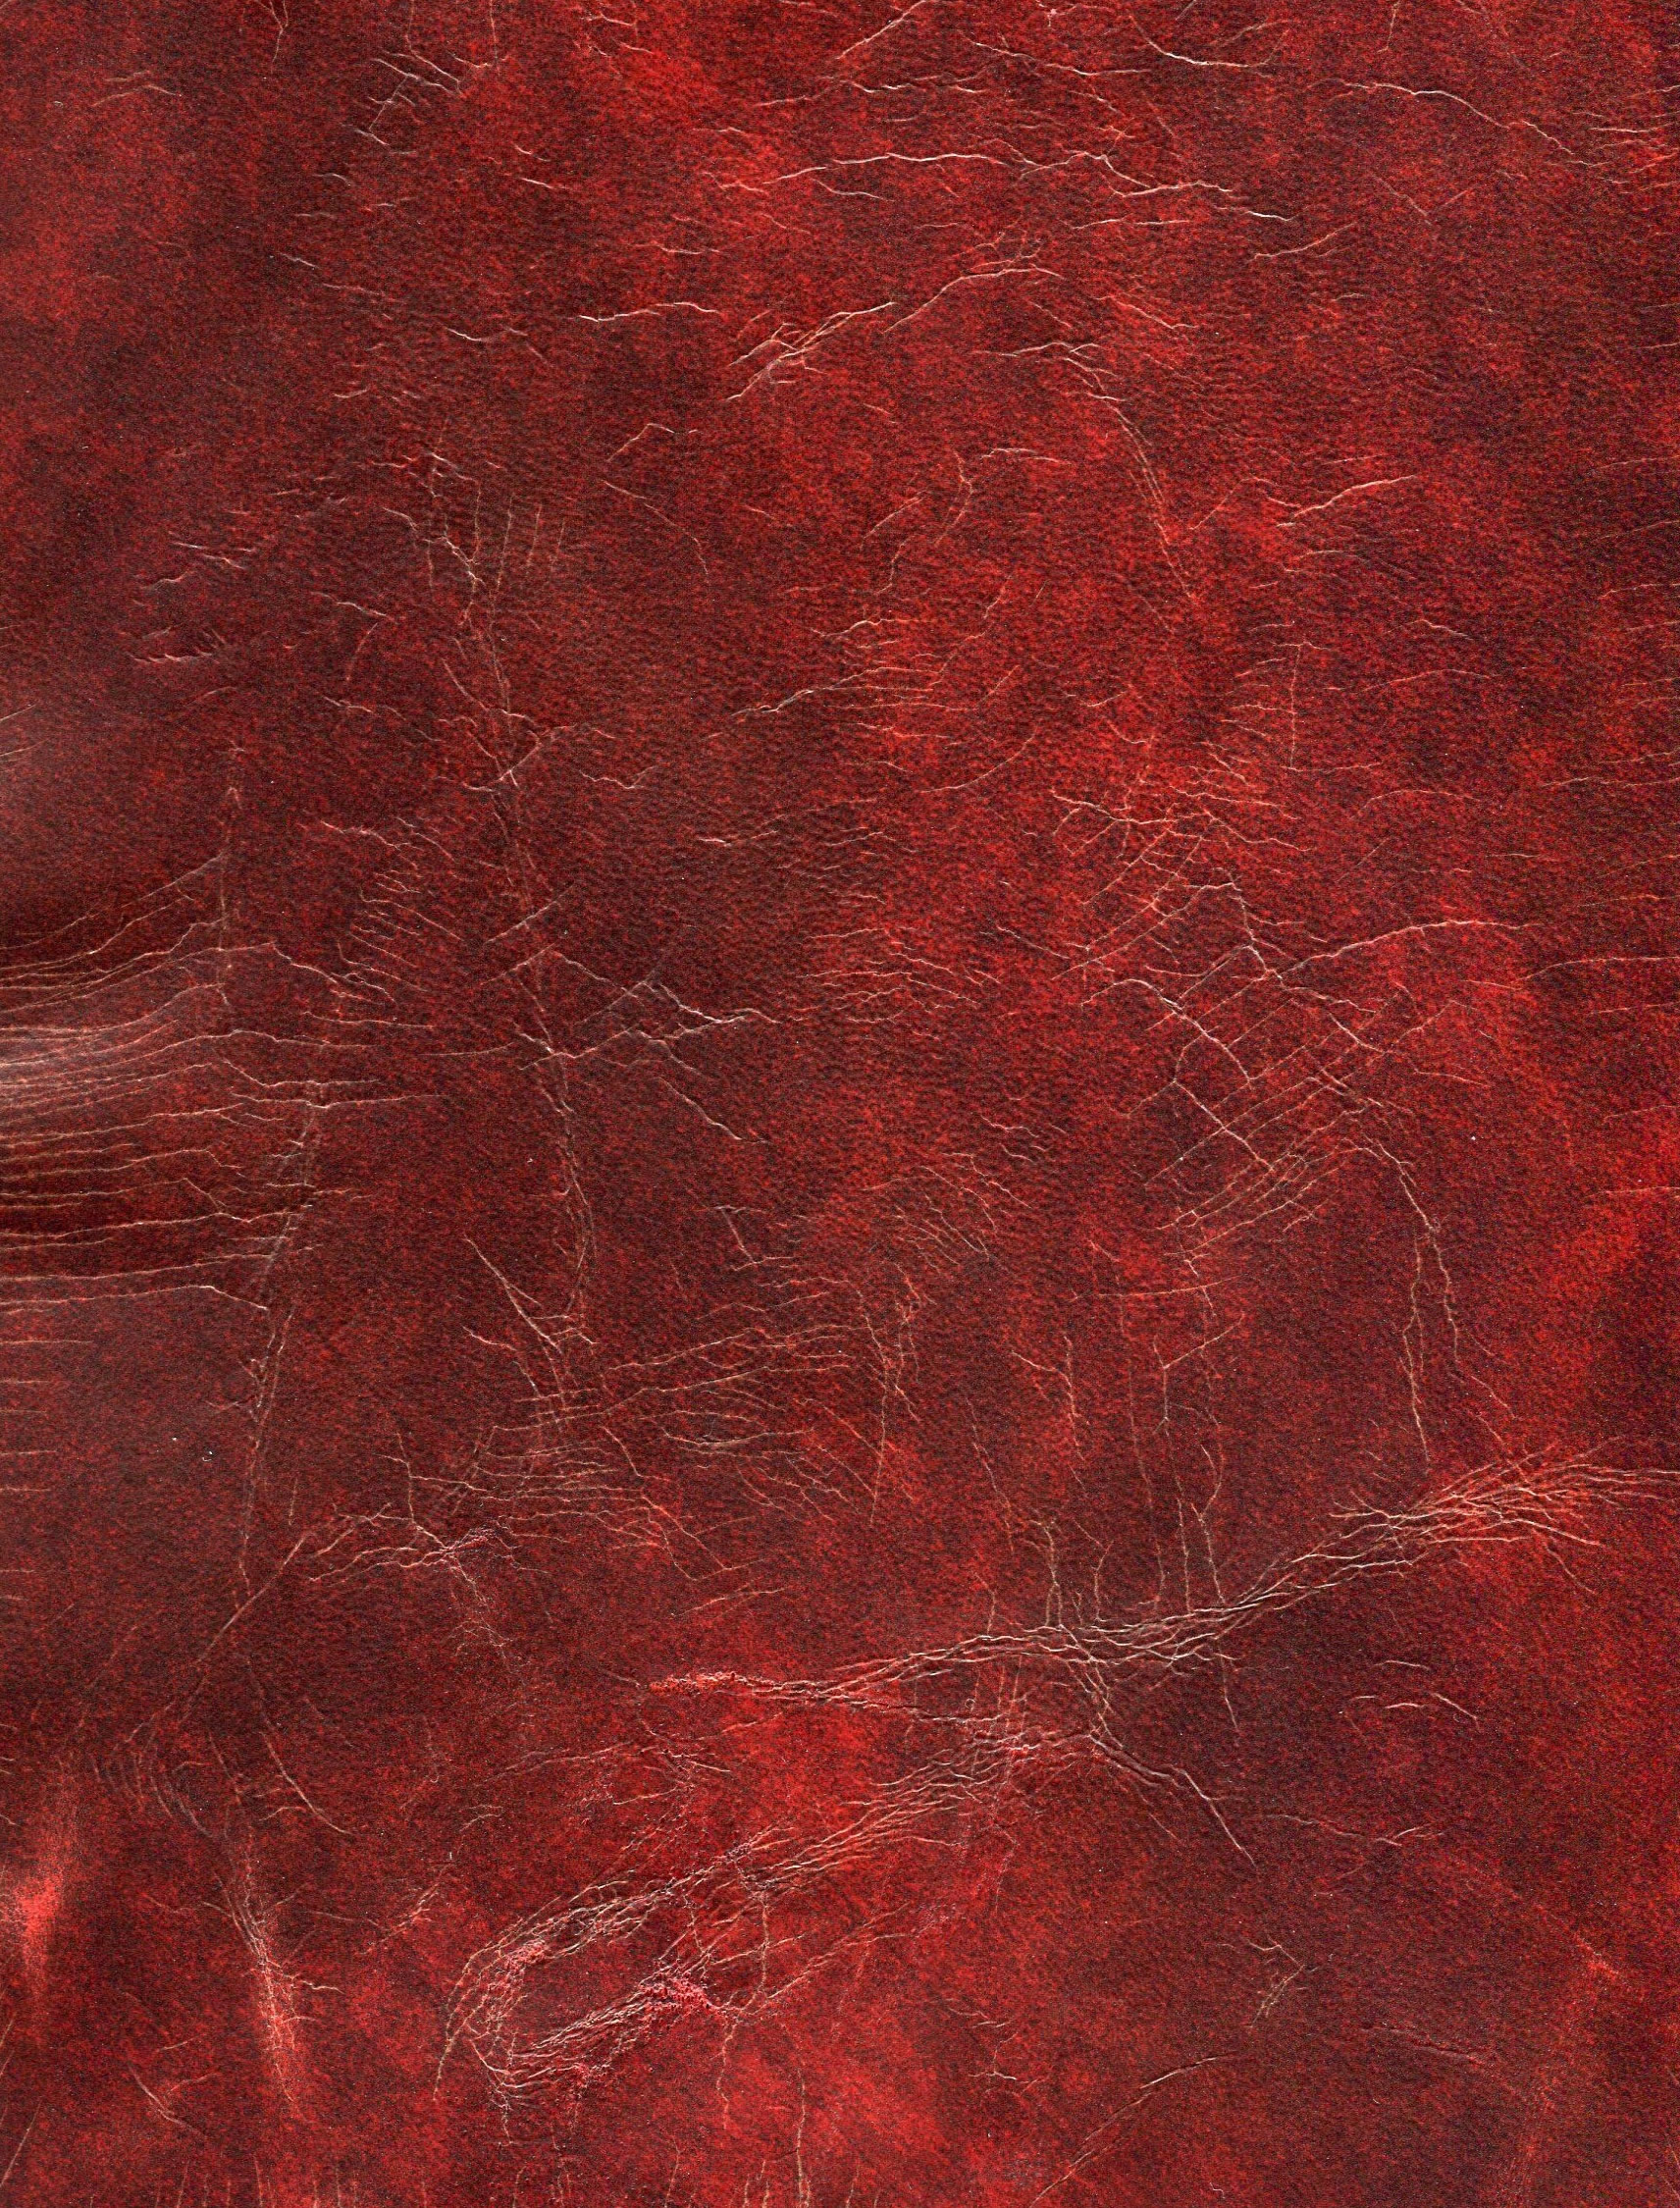 Ox Blood.jpg